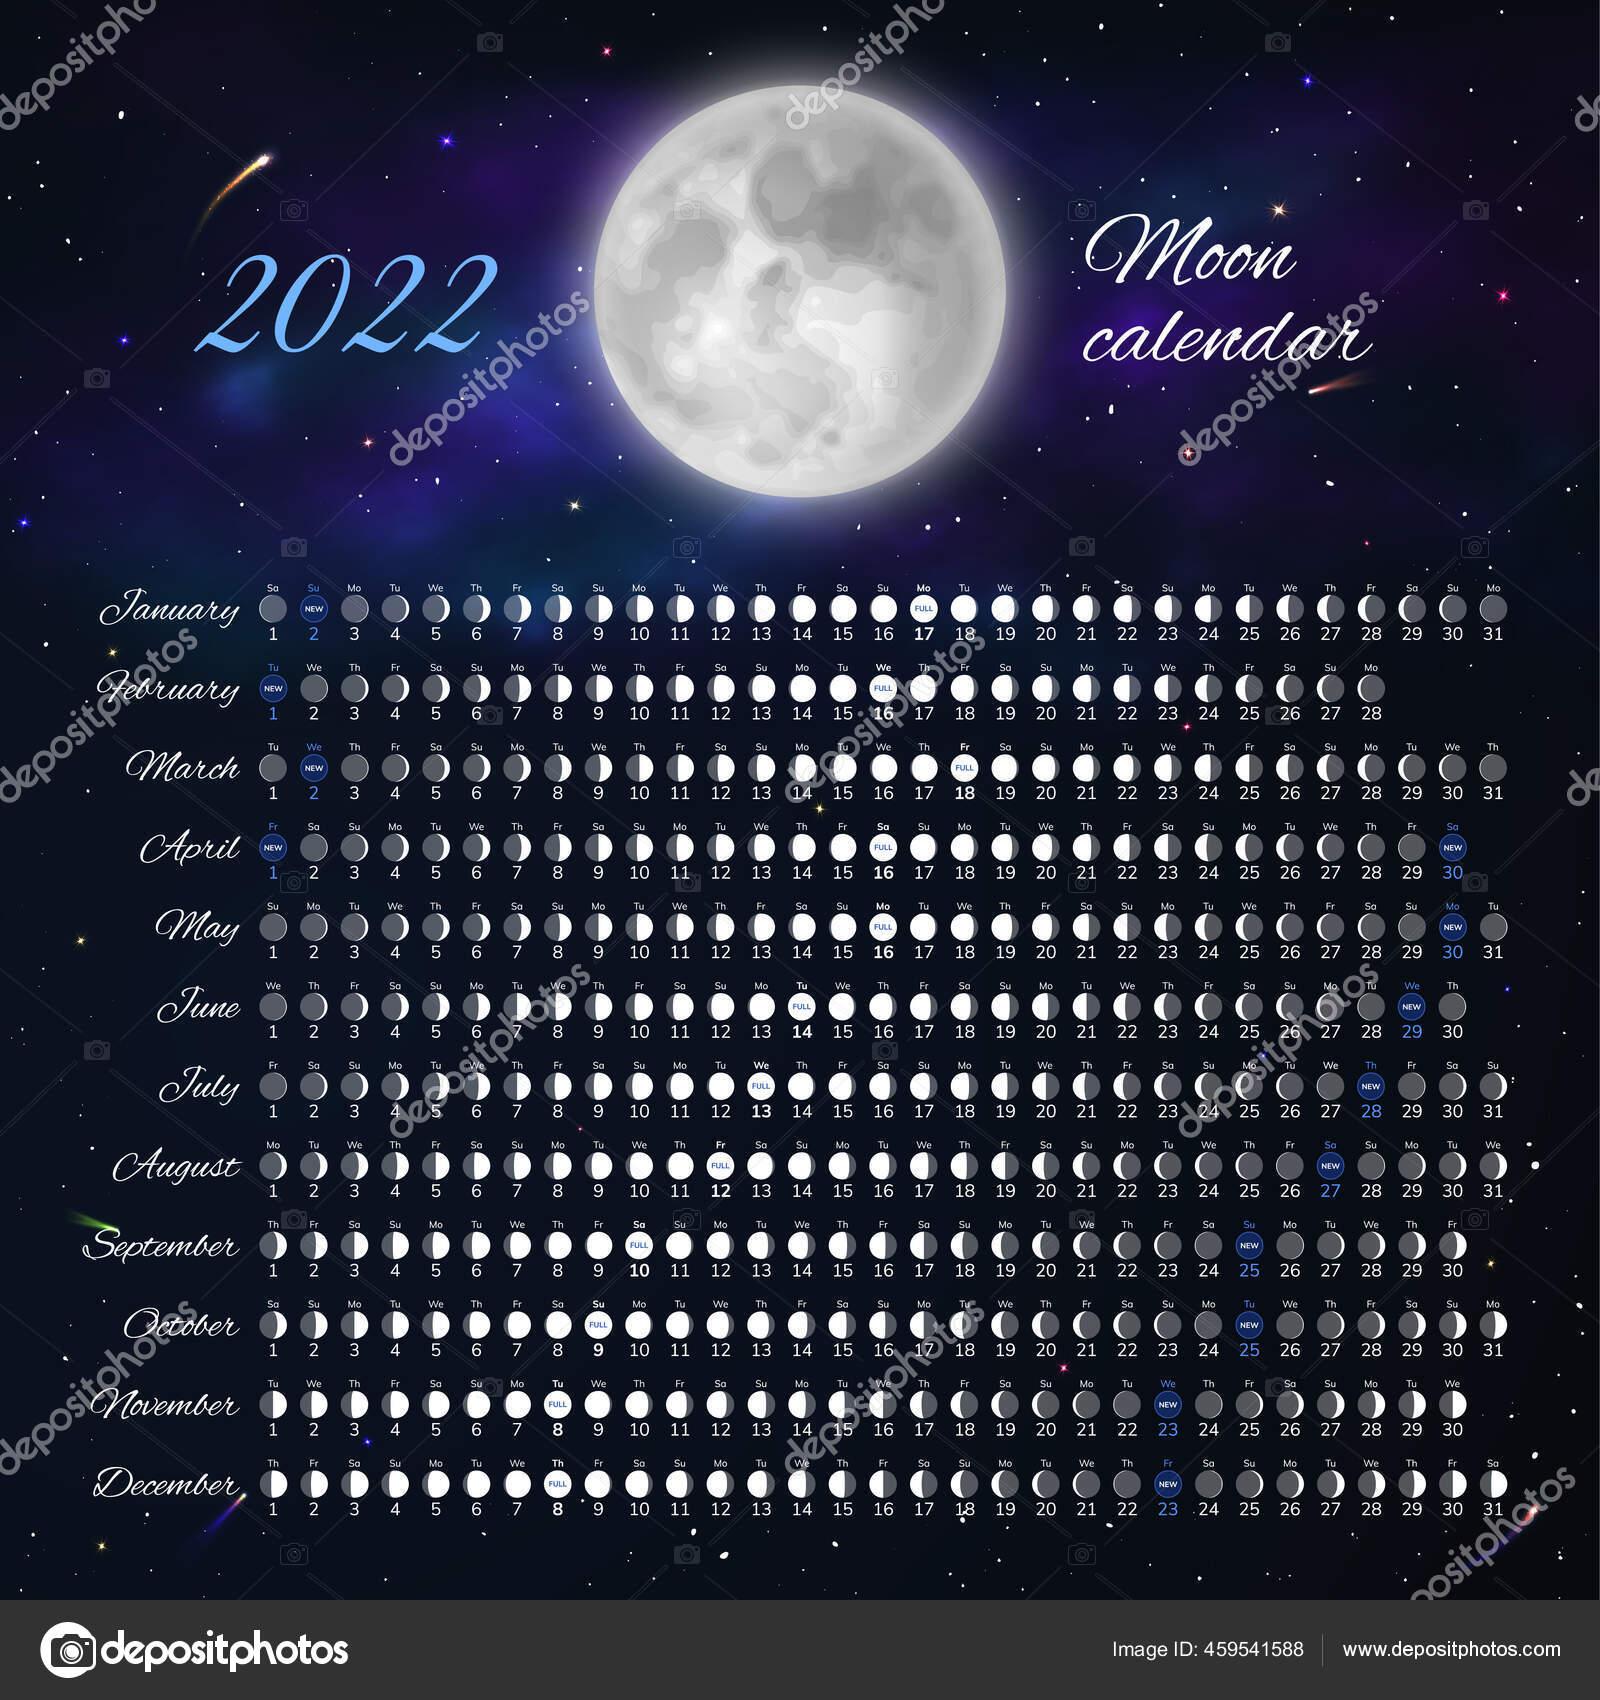 Celestial Calendar 2022.Moon Phase Cycle Astrological Calendar Card Design Vector Image By C Nastya Mal Vector Stock 459541588